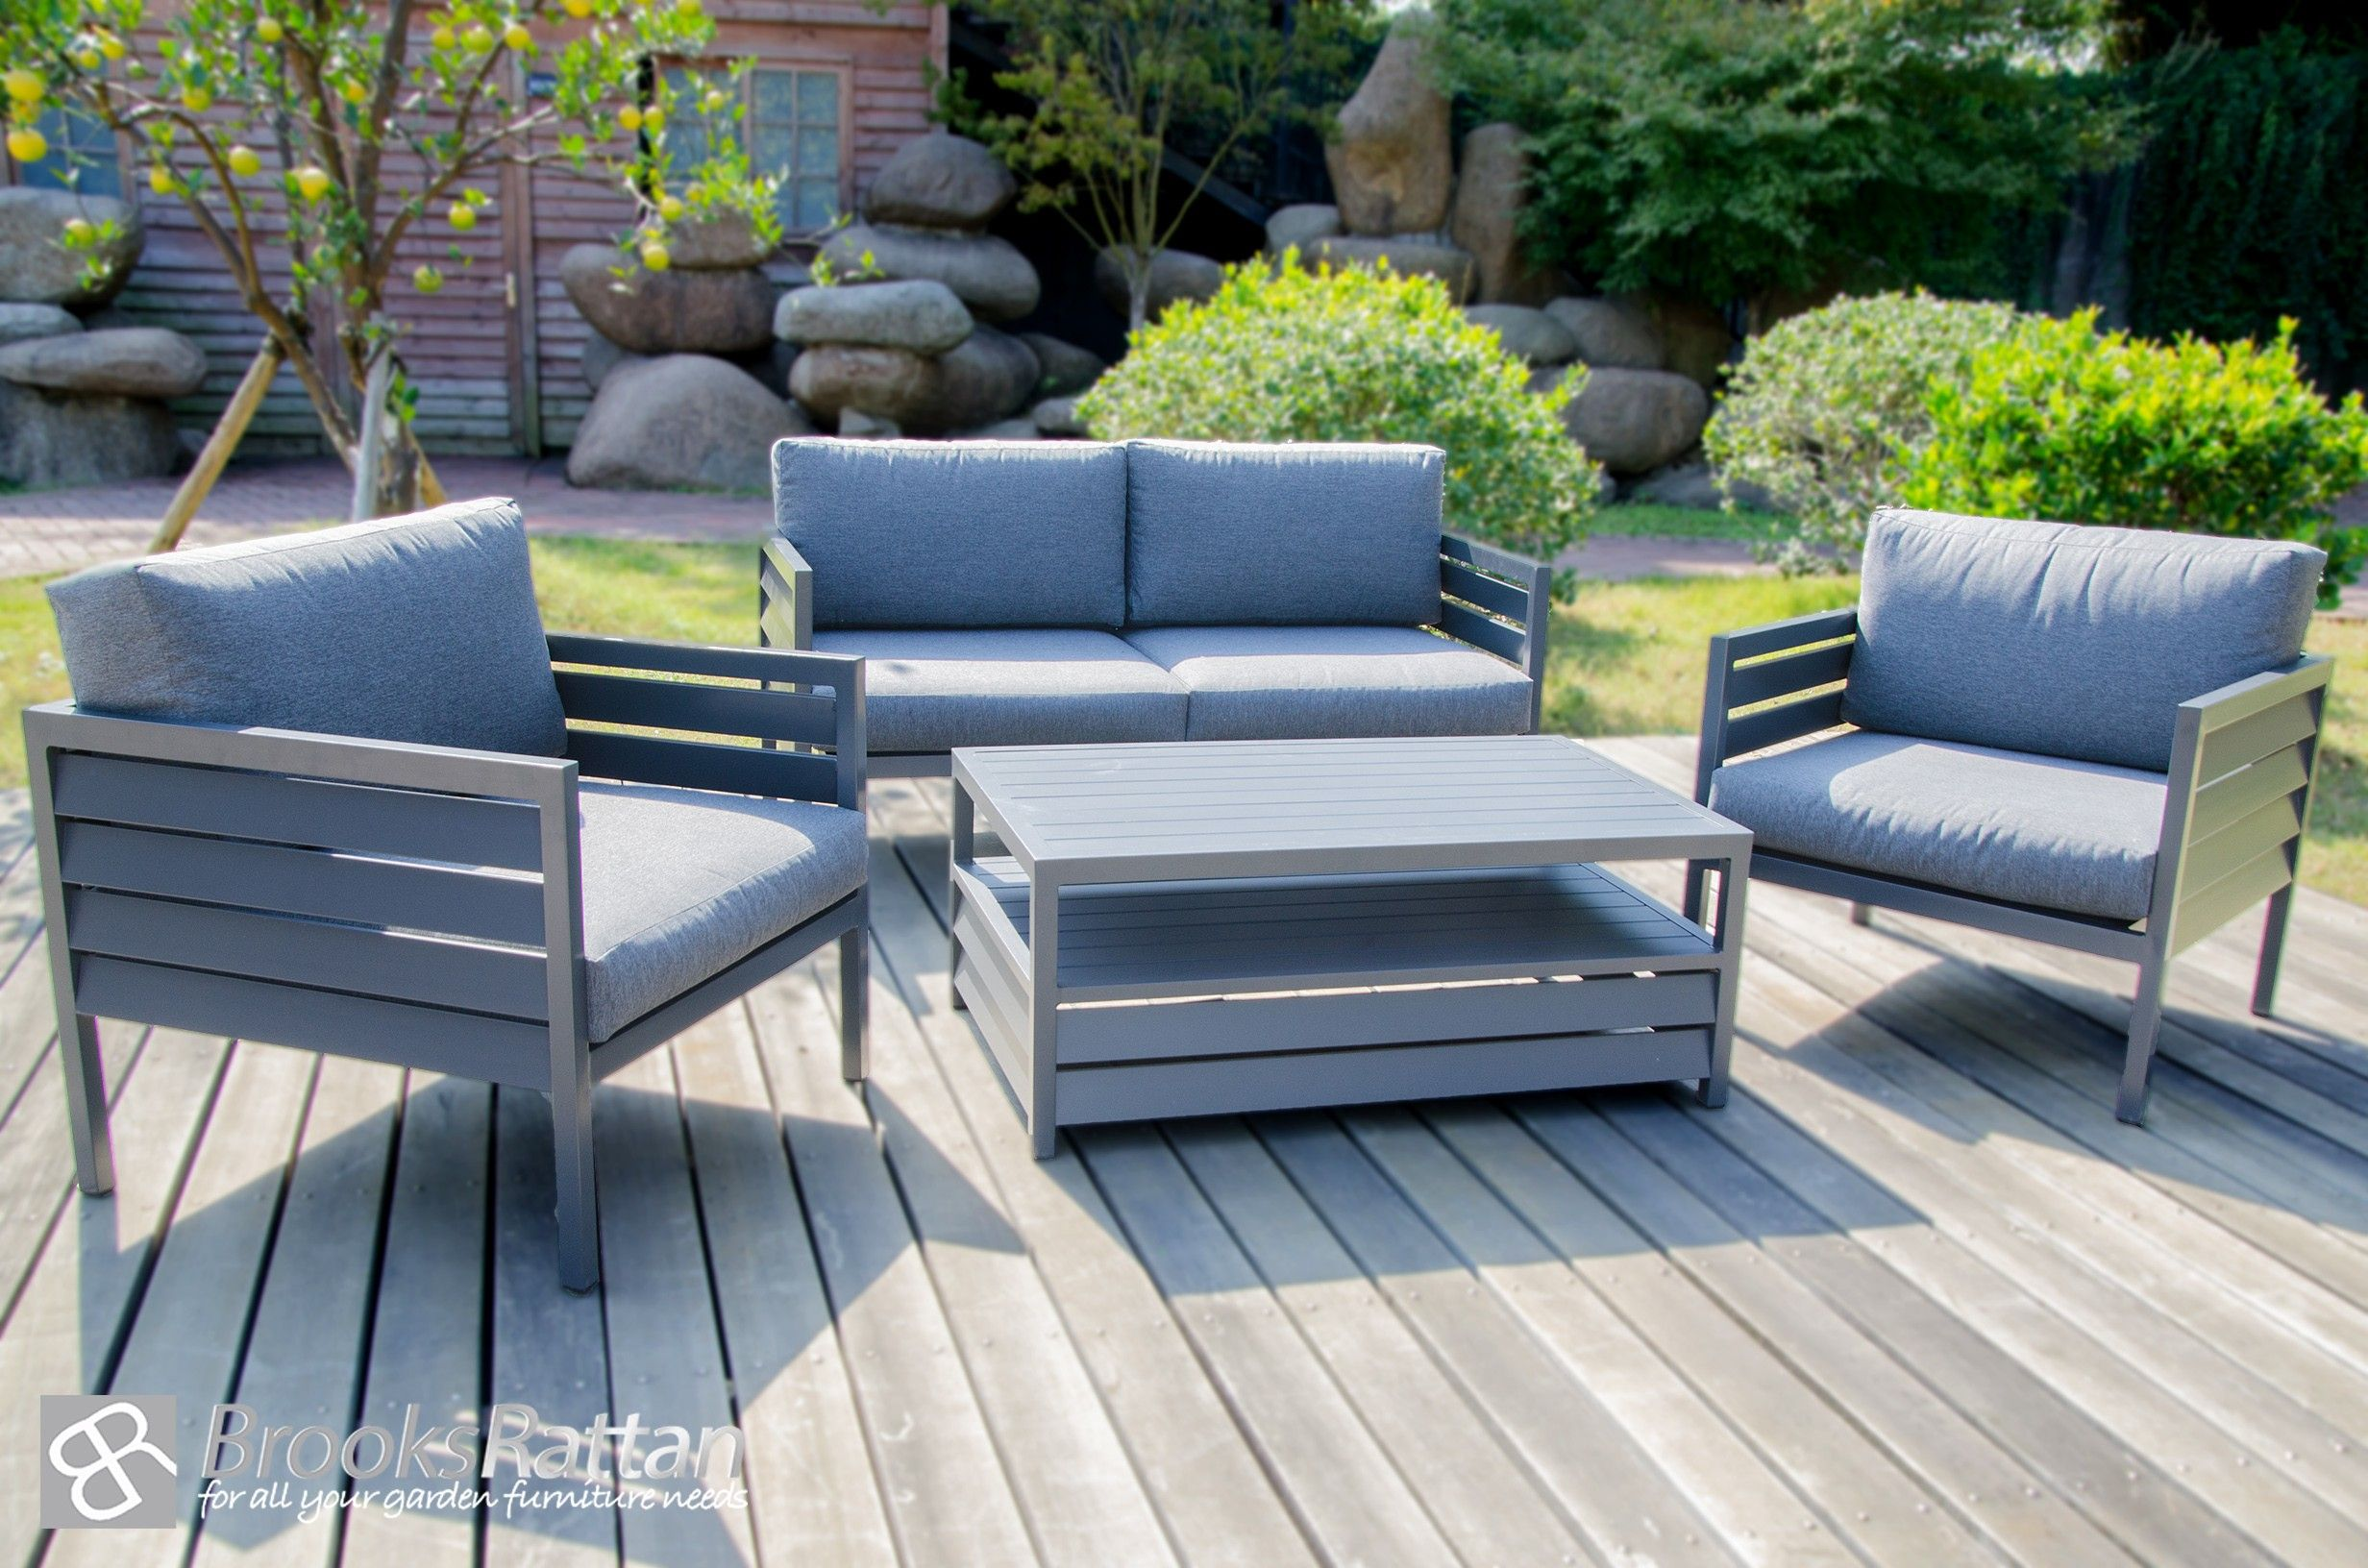 Terrific Shutter 4 Seater Sofa Set River Walk Rattan Garden Beutiful Home Inspiration Truamahrainfo